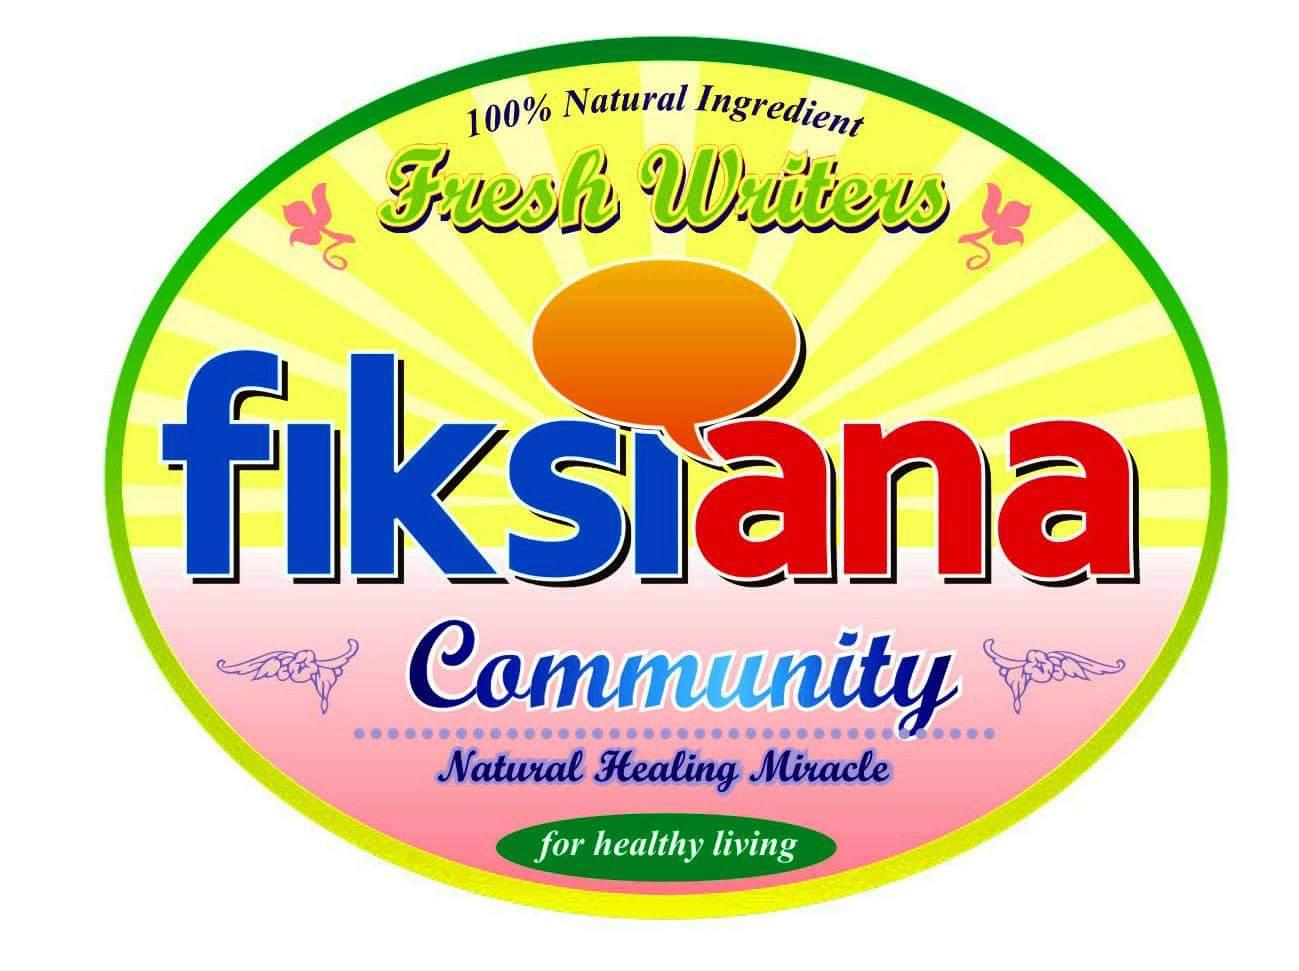 items/kaleidoskop_2020/fiksiana-hires-1607599721.jpeg